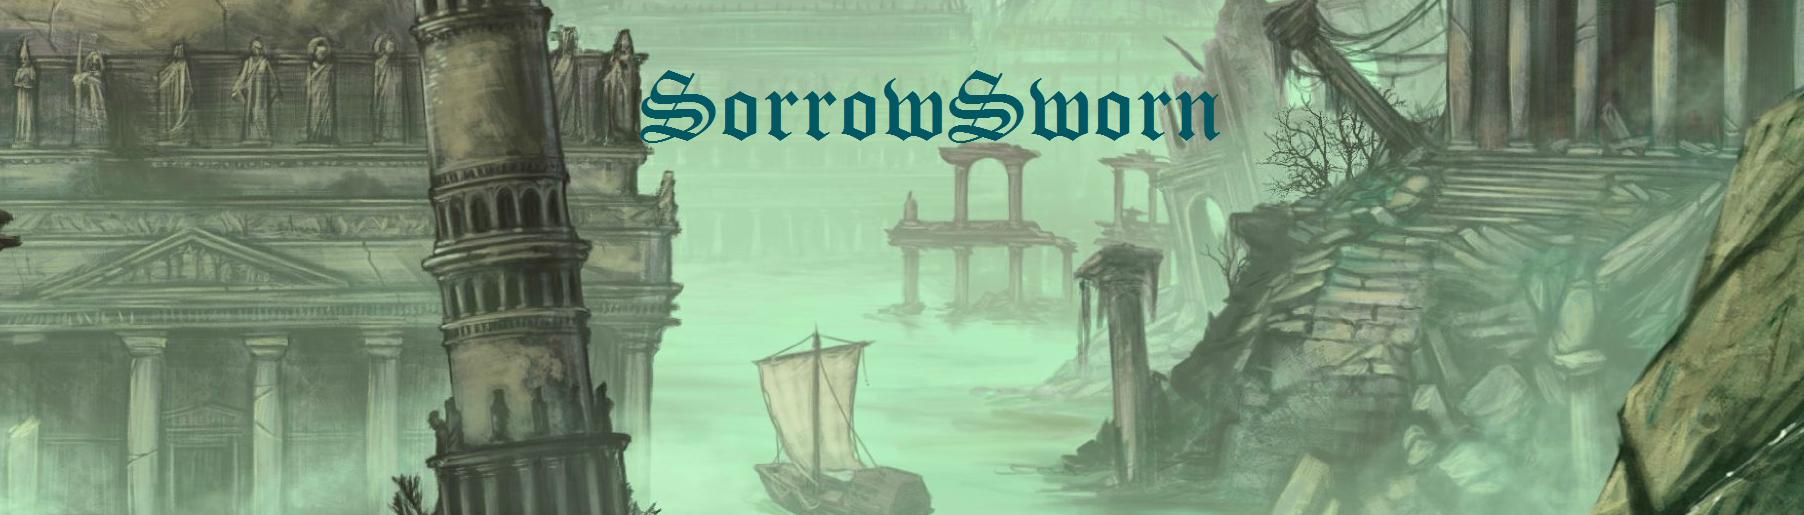 Sorrowsworn banner